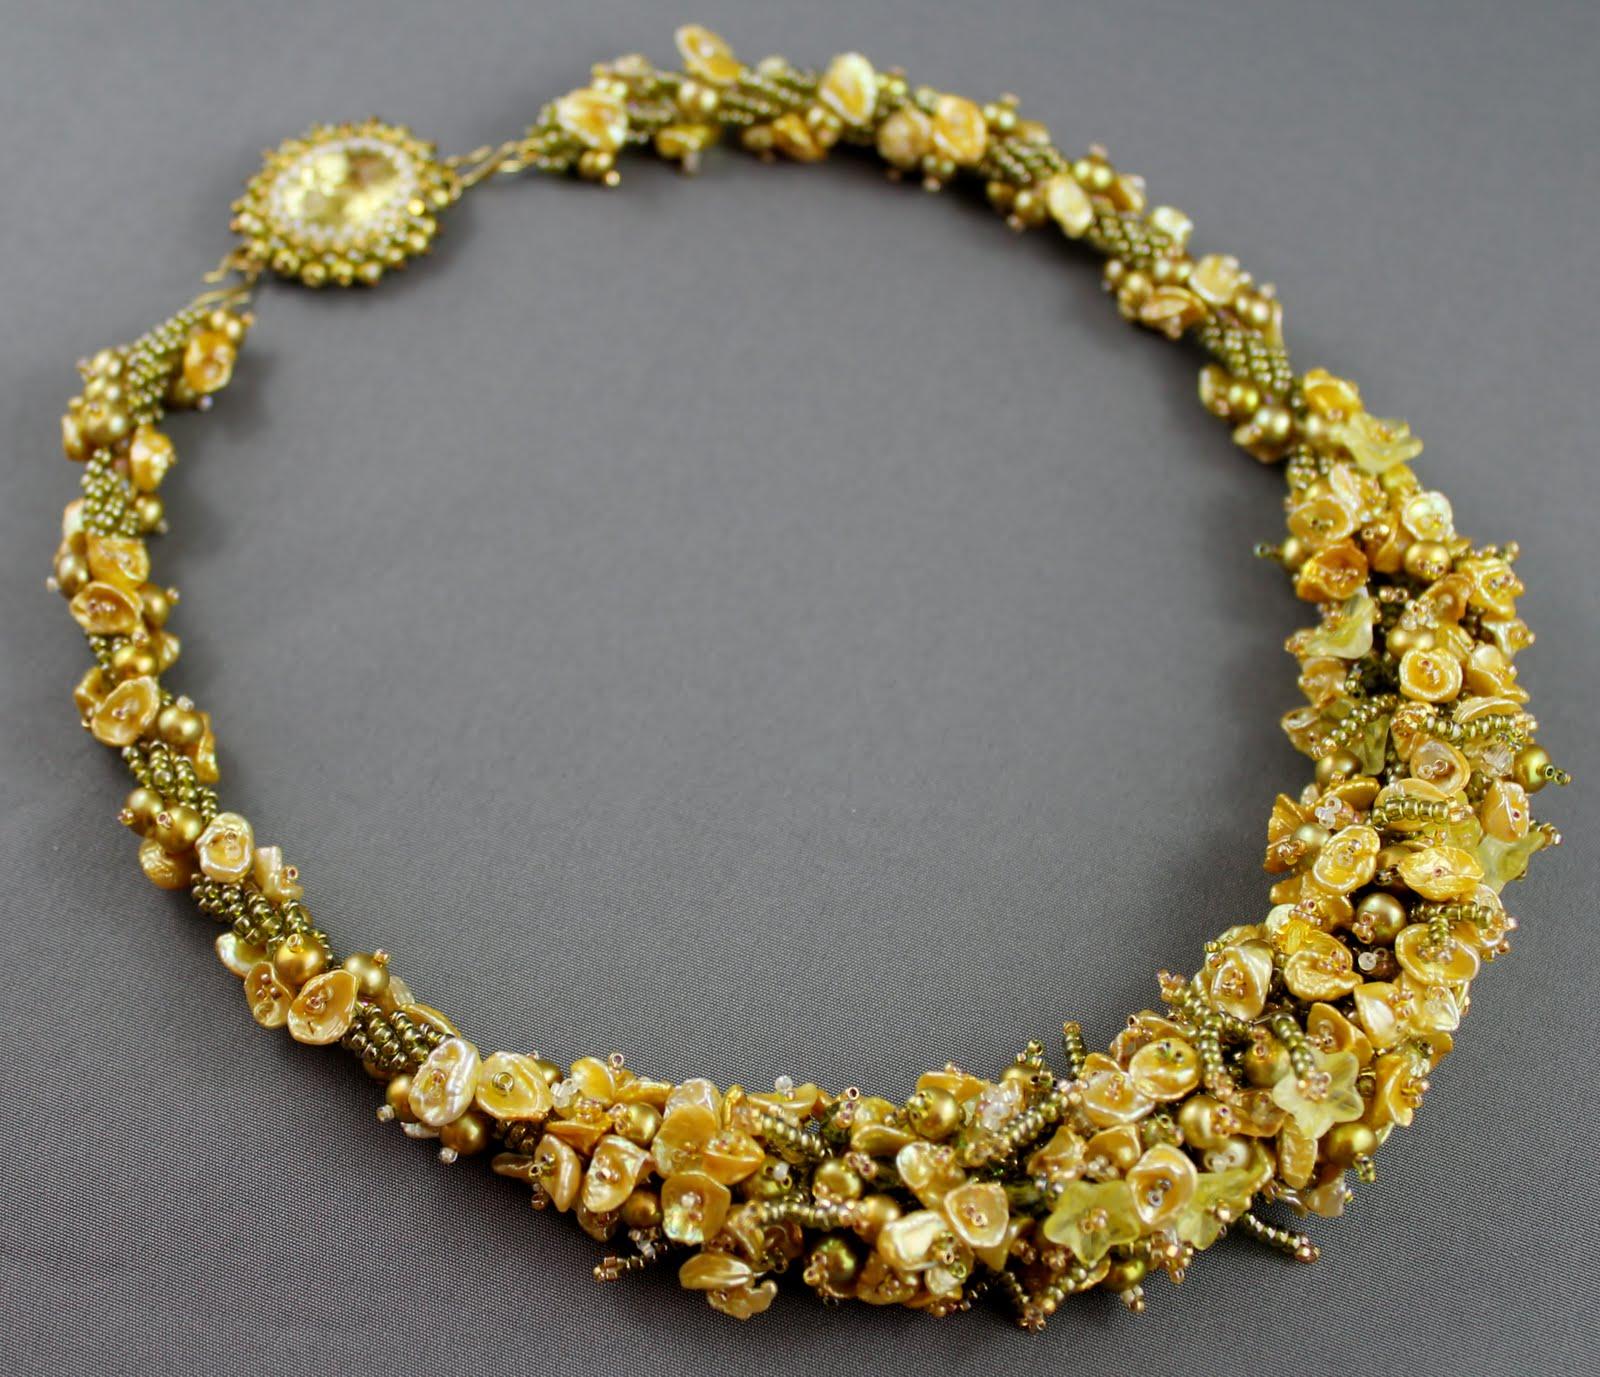 Keshi Pearl Necklace: RosemaryB Jewellery: Gold Keshi Pearl Necklace